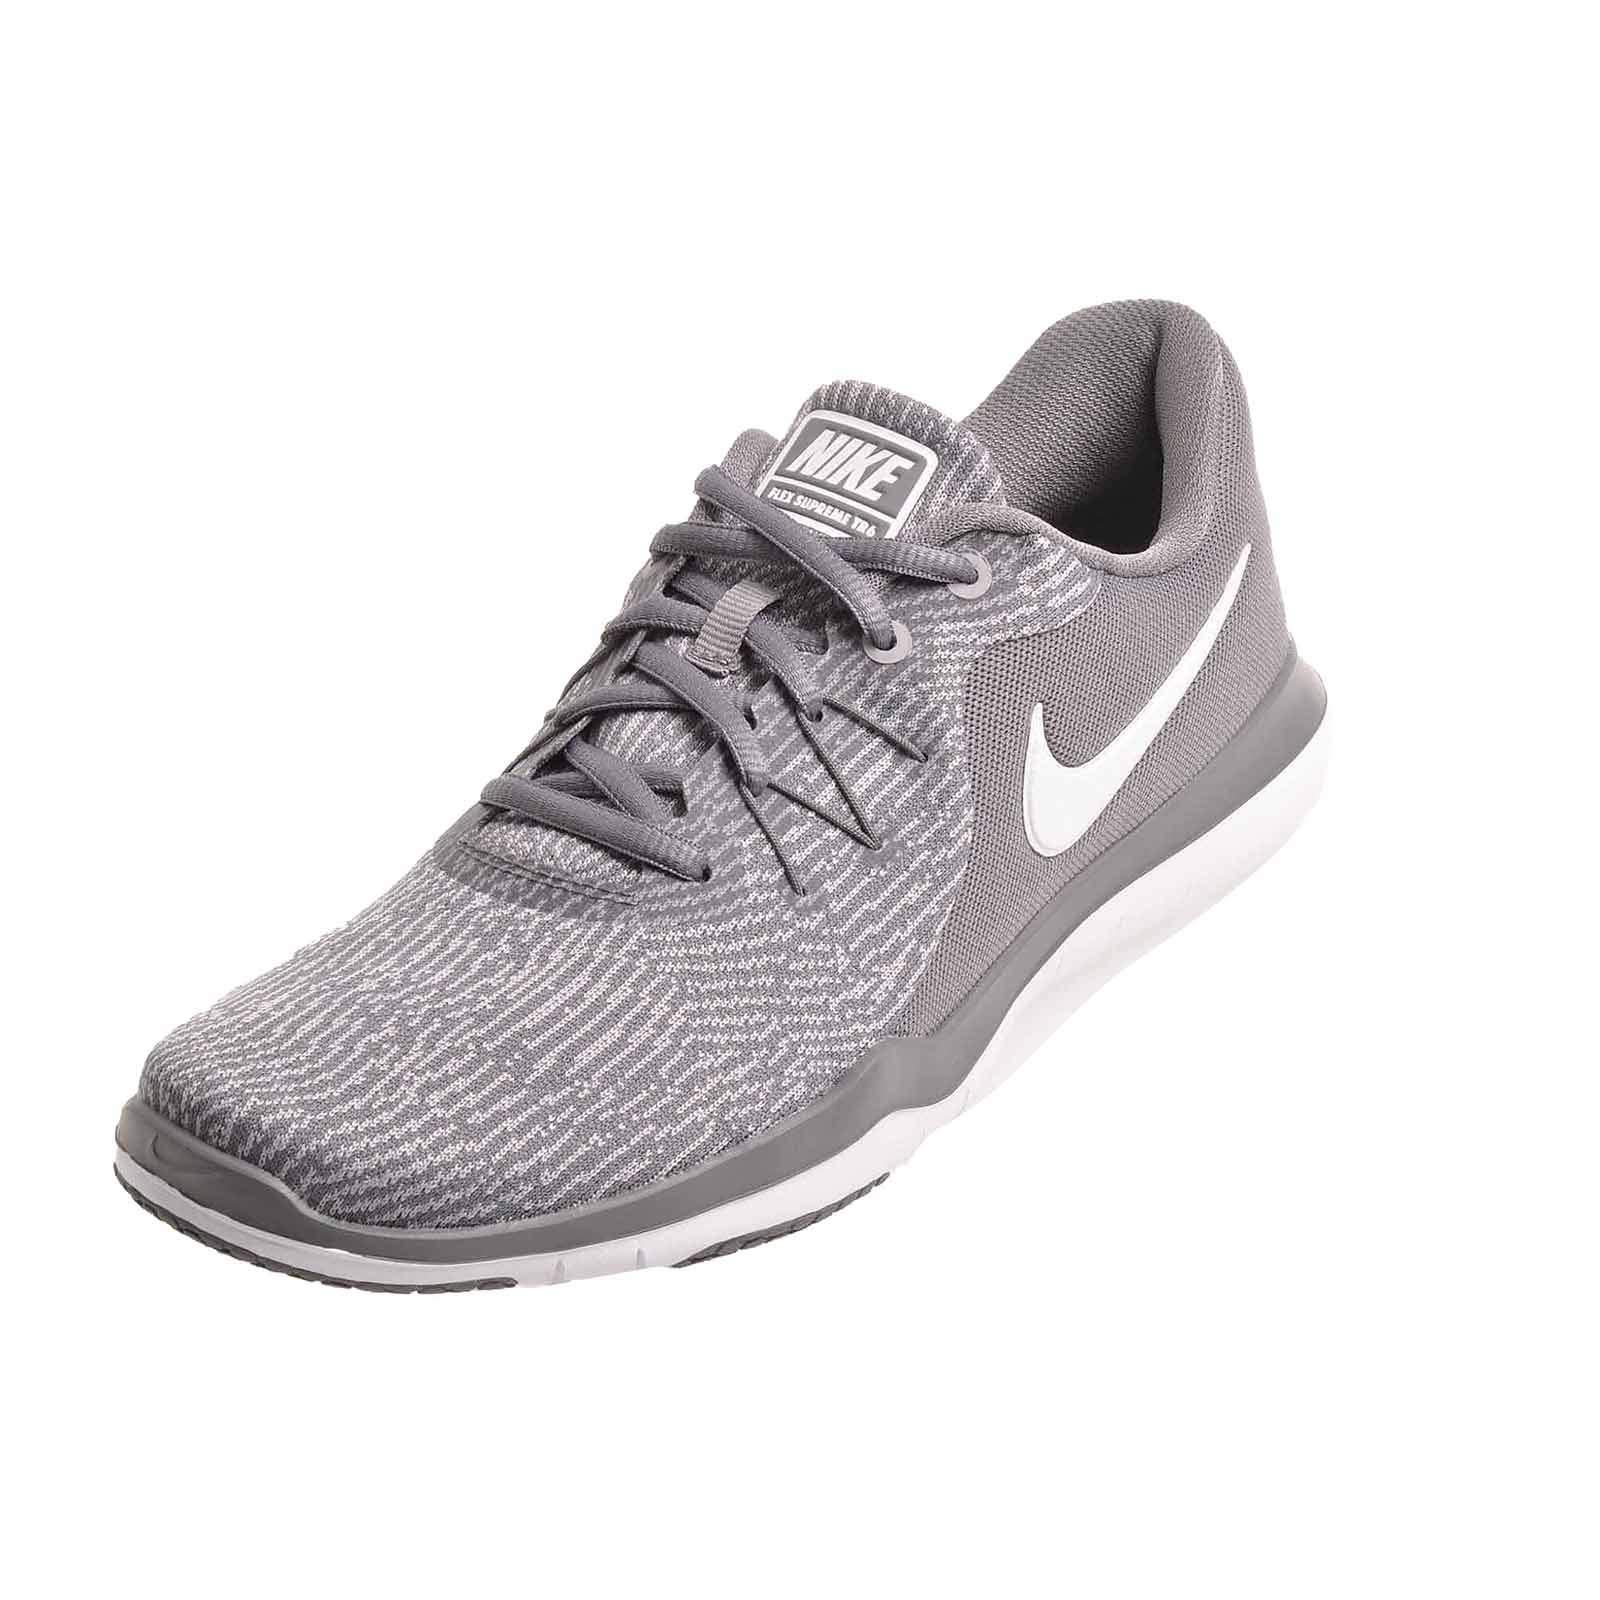 first rate cdf25 0f4ef Galleon - NIKE Womens Flex Supreme TR 6 (W) Cross Training Shoes, Gunsmoke  White, Size 10.5 Wide